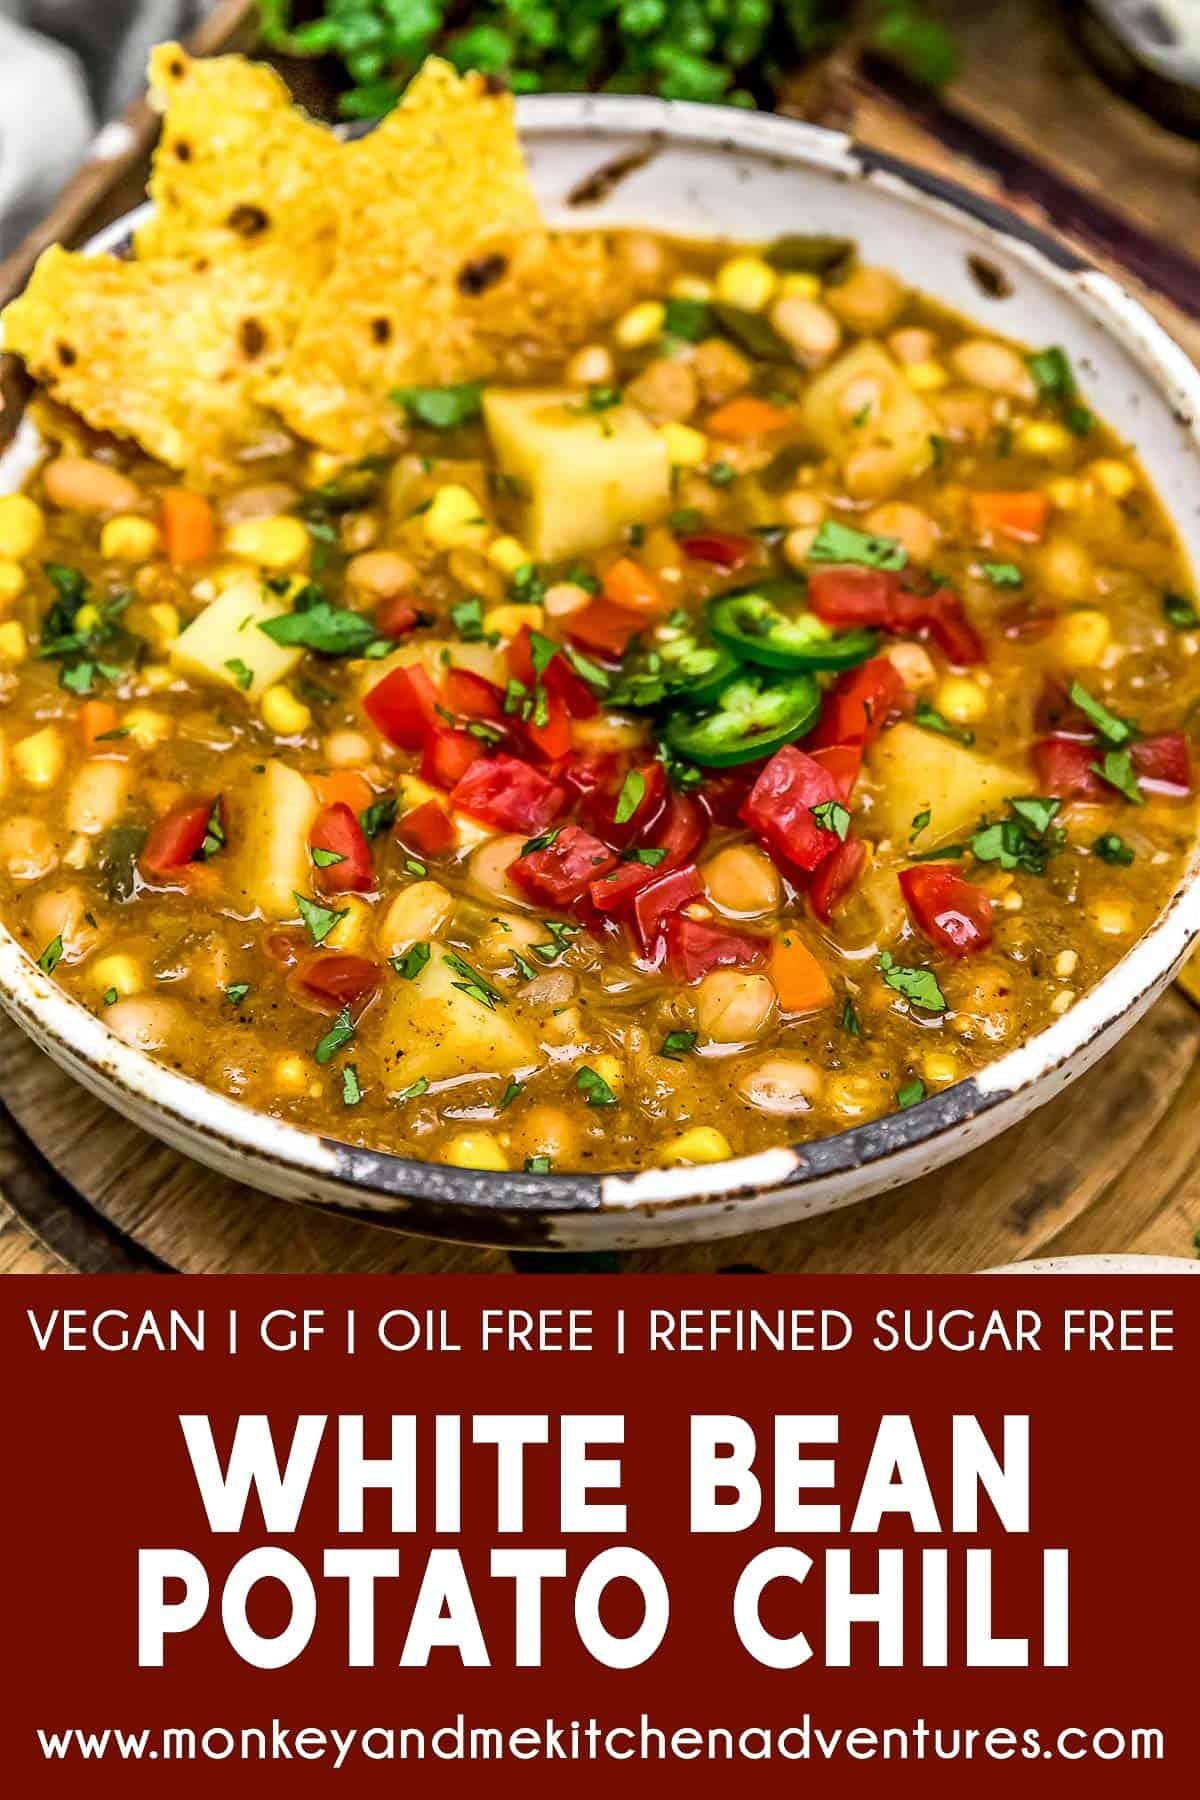 White Bean Potato Chili with text description